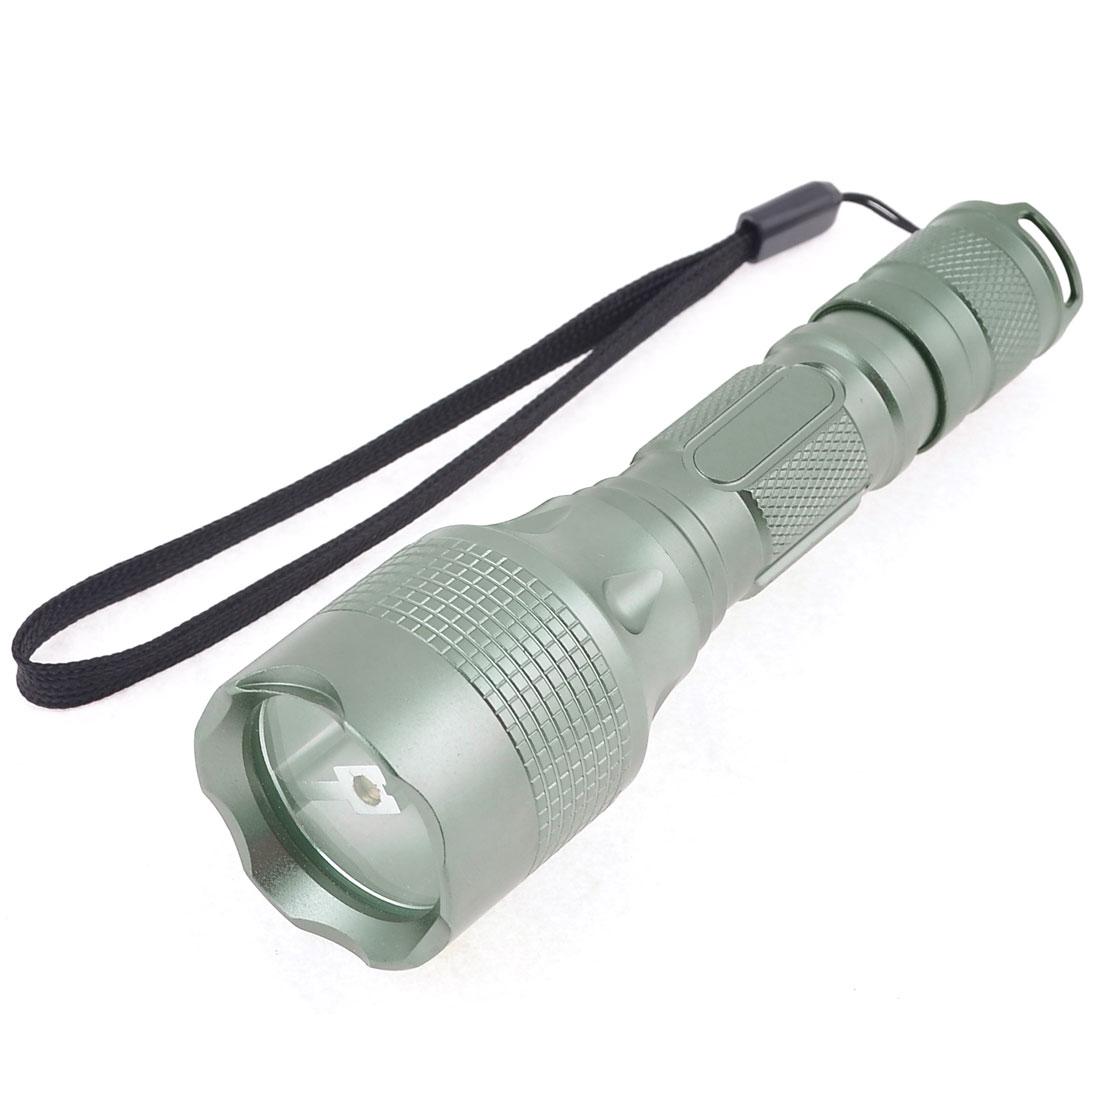 "Nonslip Handle 250LM LED White Light Camping Flashlight Gray 5.5"" Long"